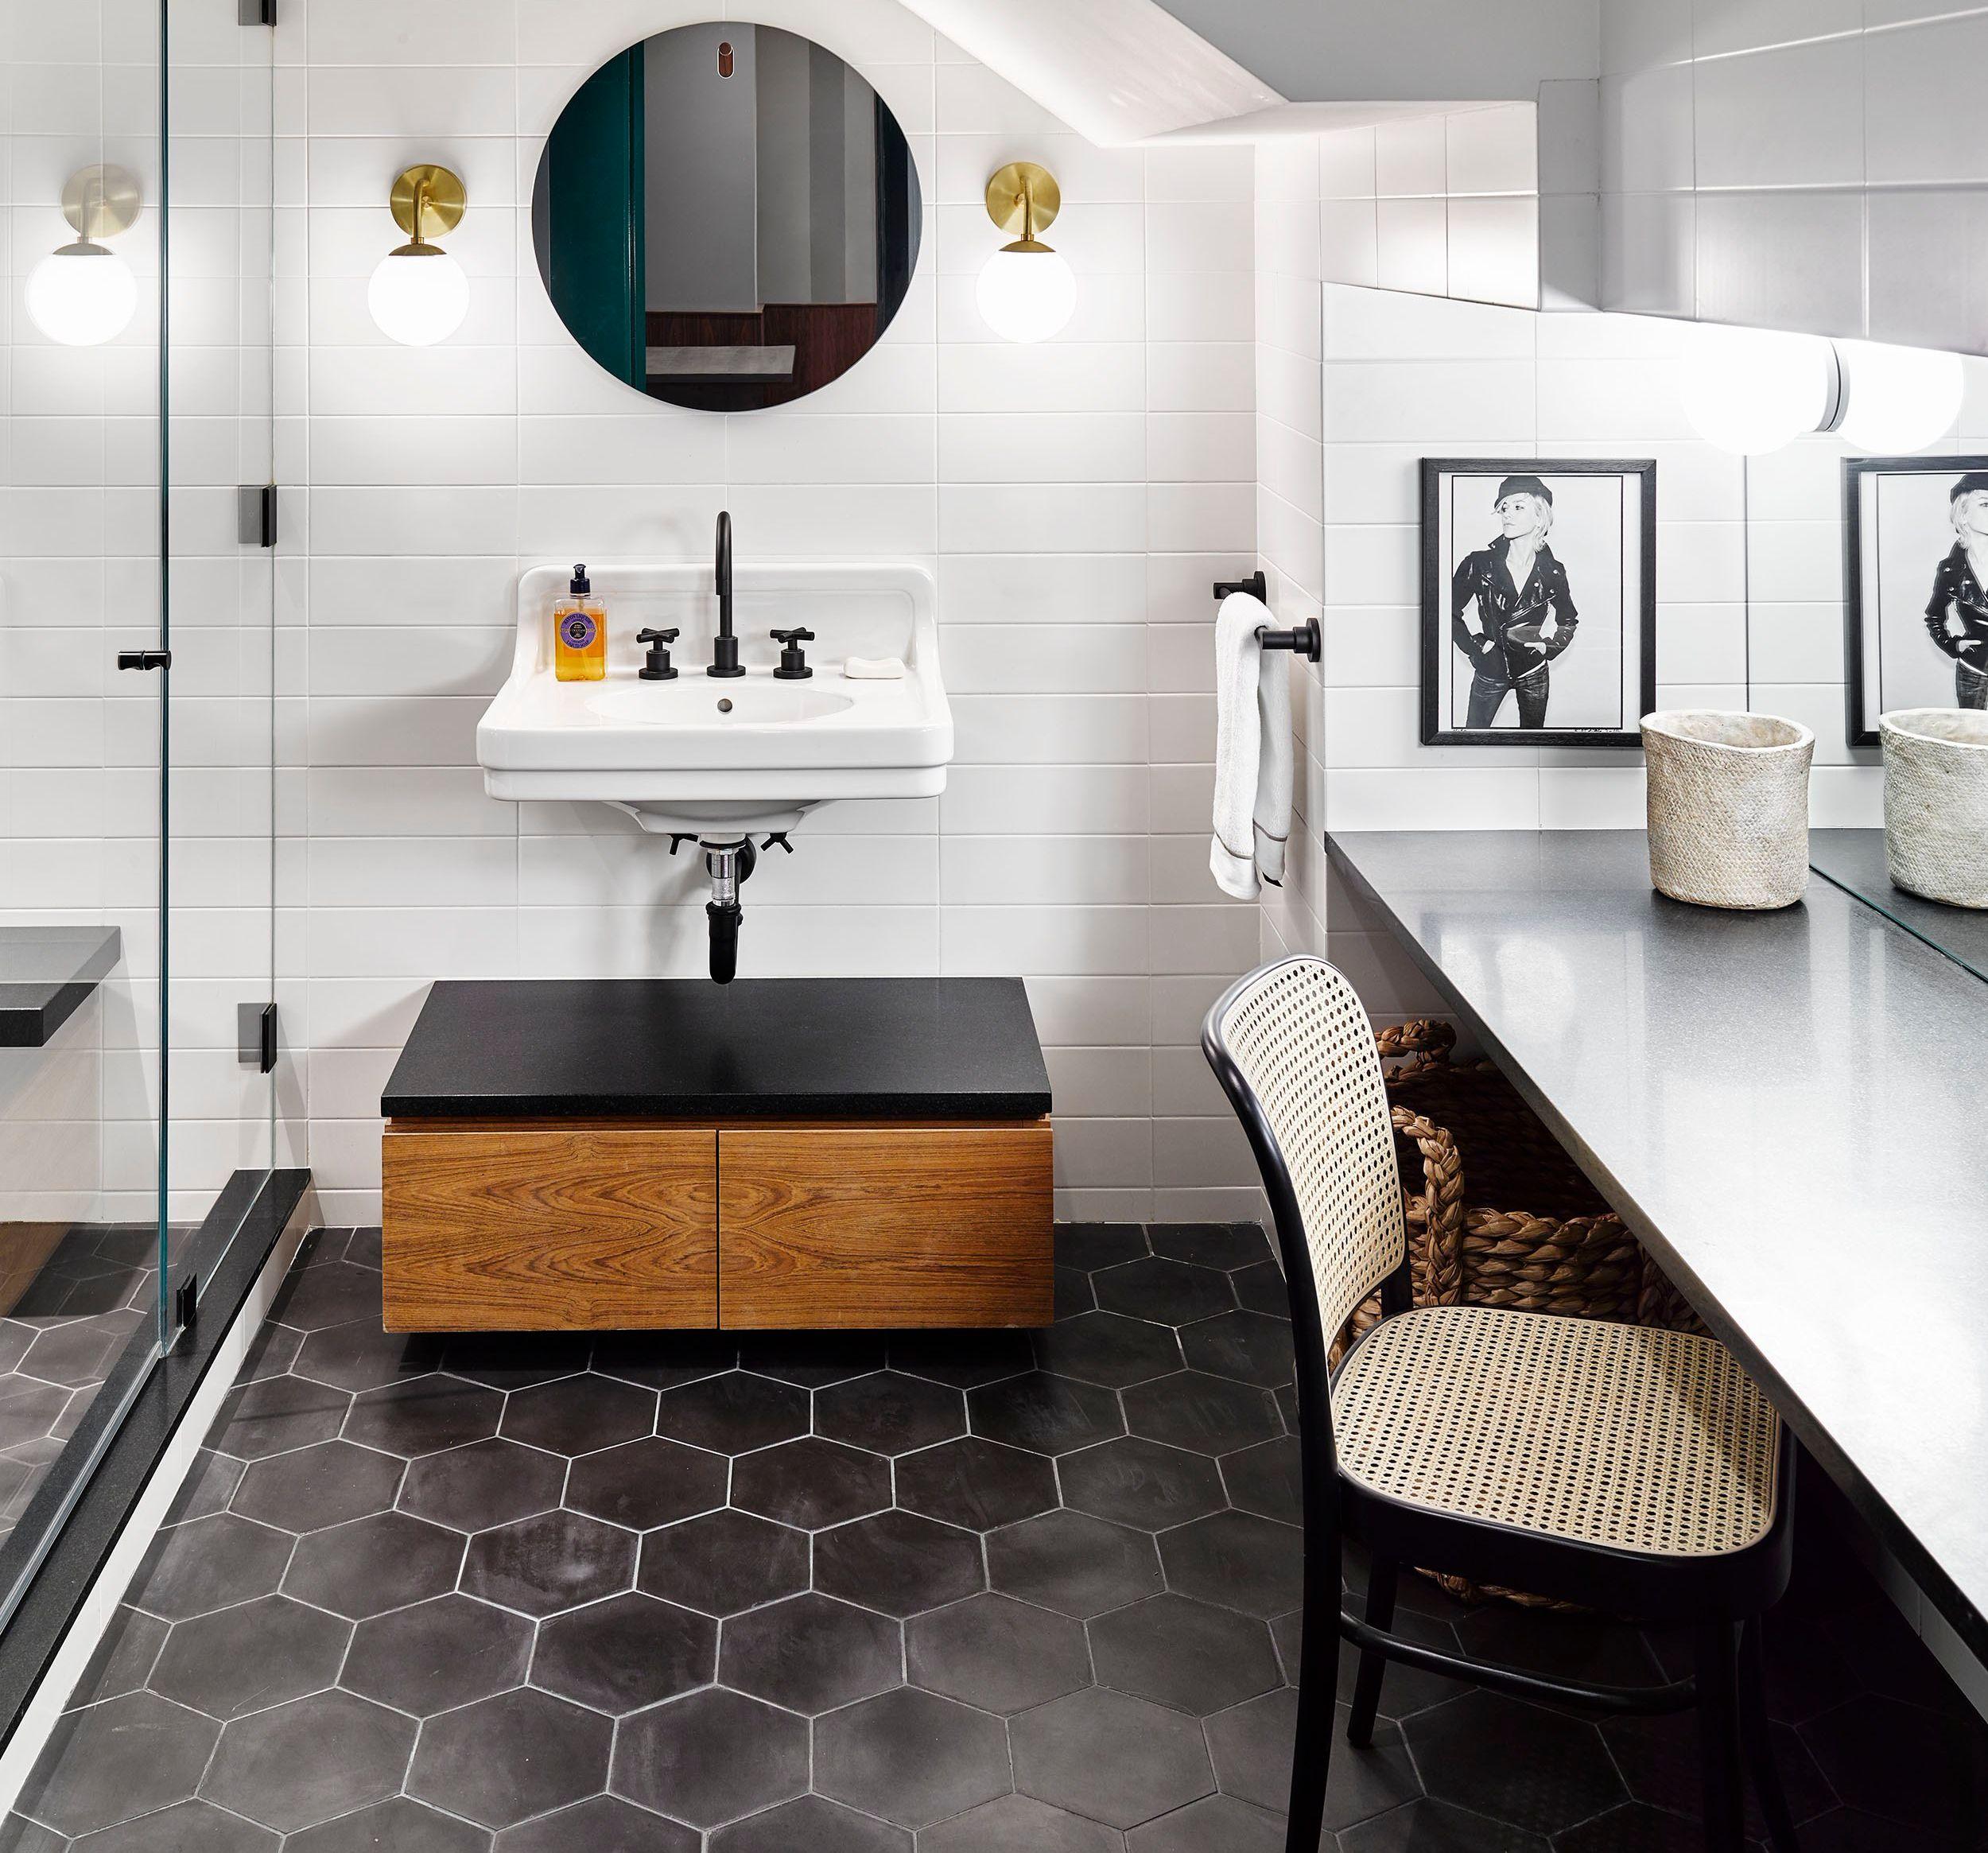 Warna Keramik Kamar Mandi Apa Yang Sesuai Dengan Kepribadianmu Modern Bathroom Design Farmhouse Master Bathroom Globe Sconce Tips memilih keramik kamar mandi